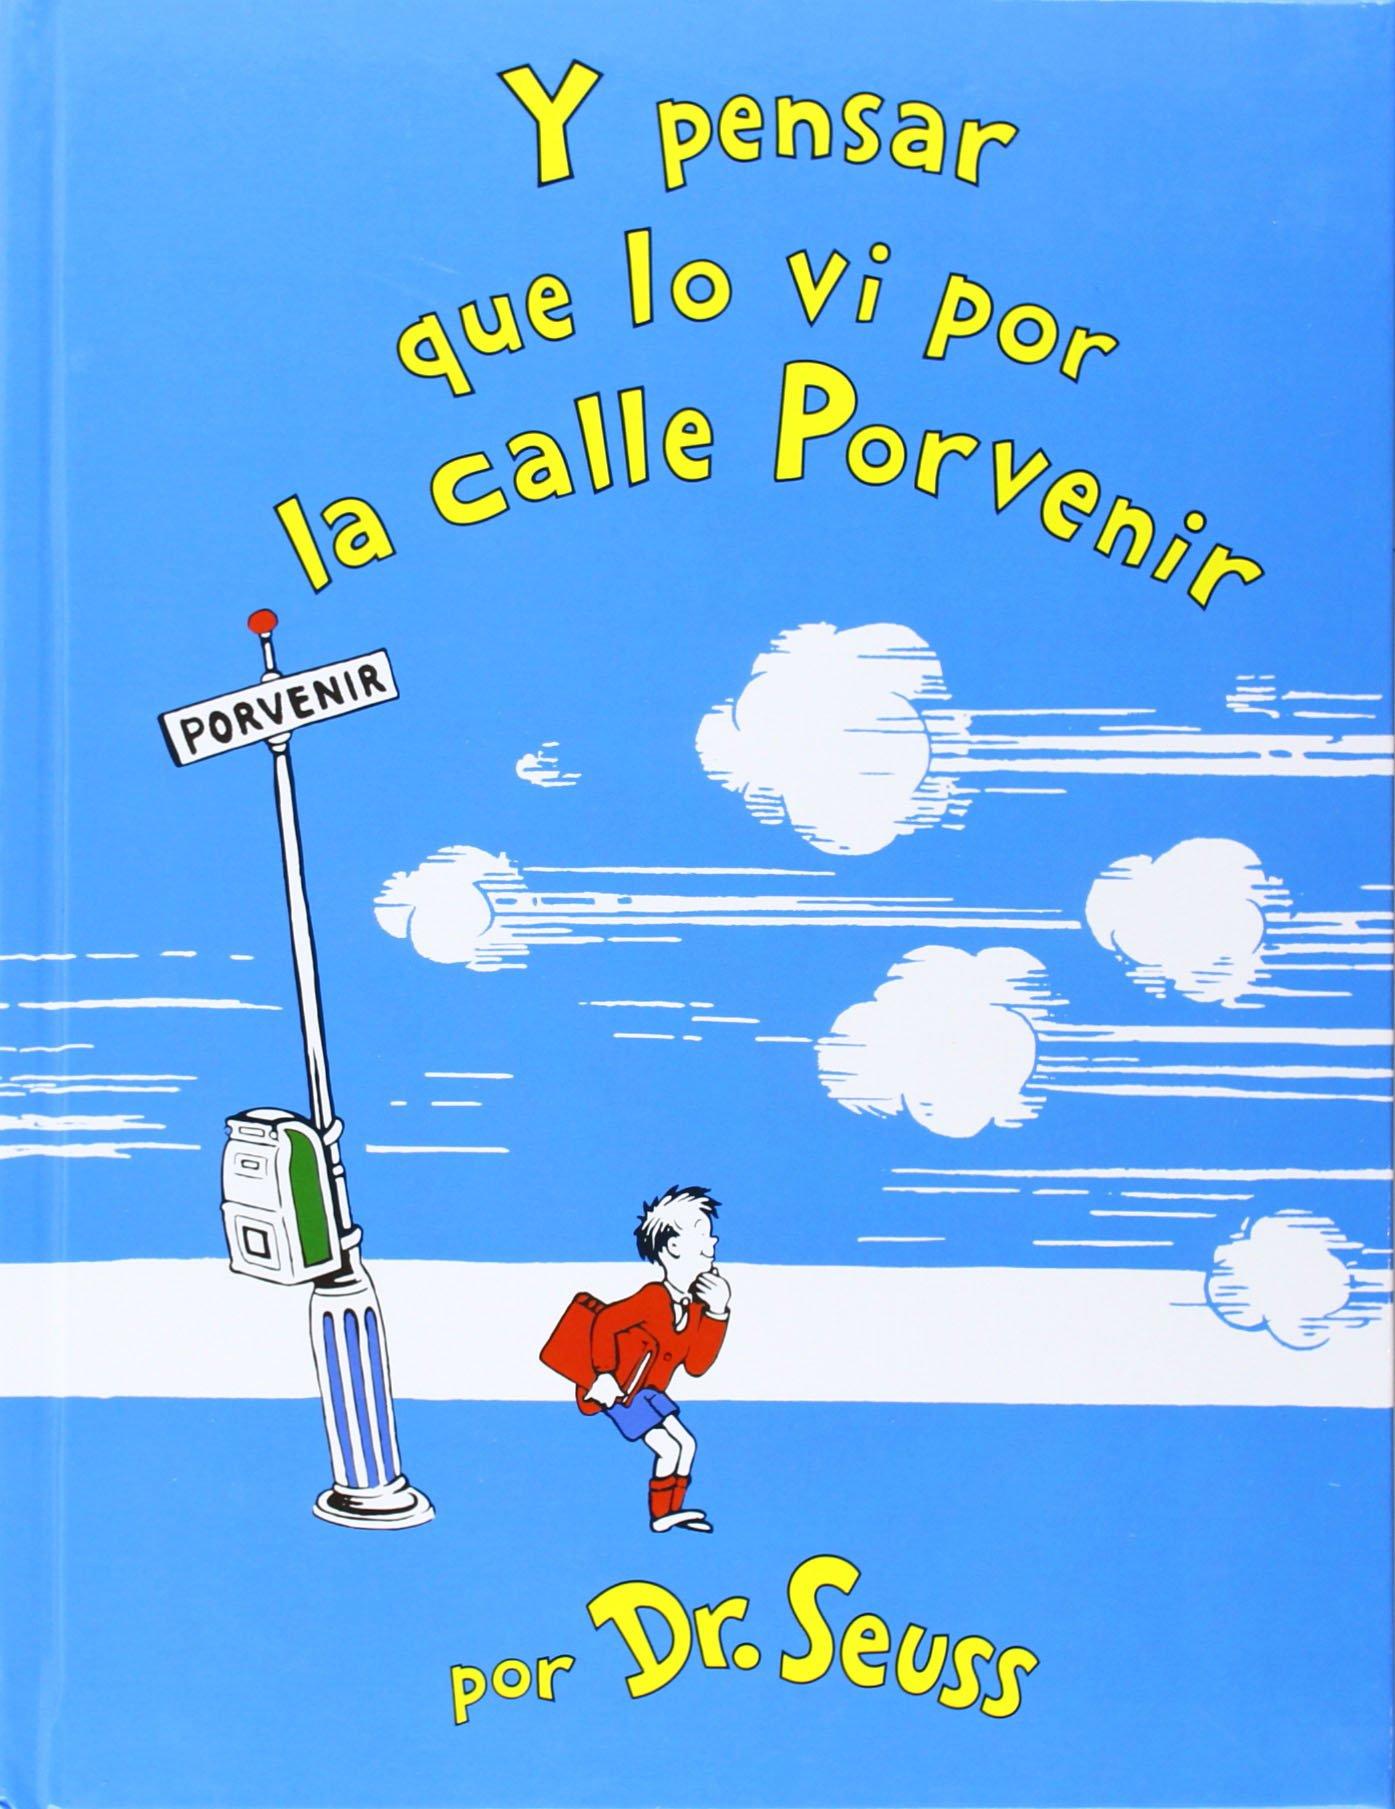 Y pensar que lo vi por la calle Porvenir (Spanish Edition): Dr Seuss,  Lectorum Publications: 9781933032078: Amazon.com: Books